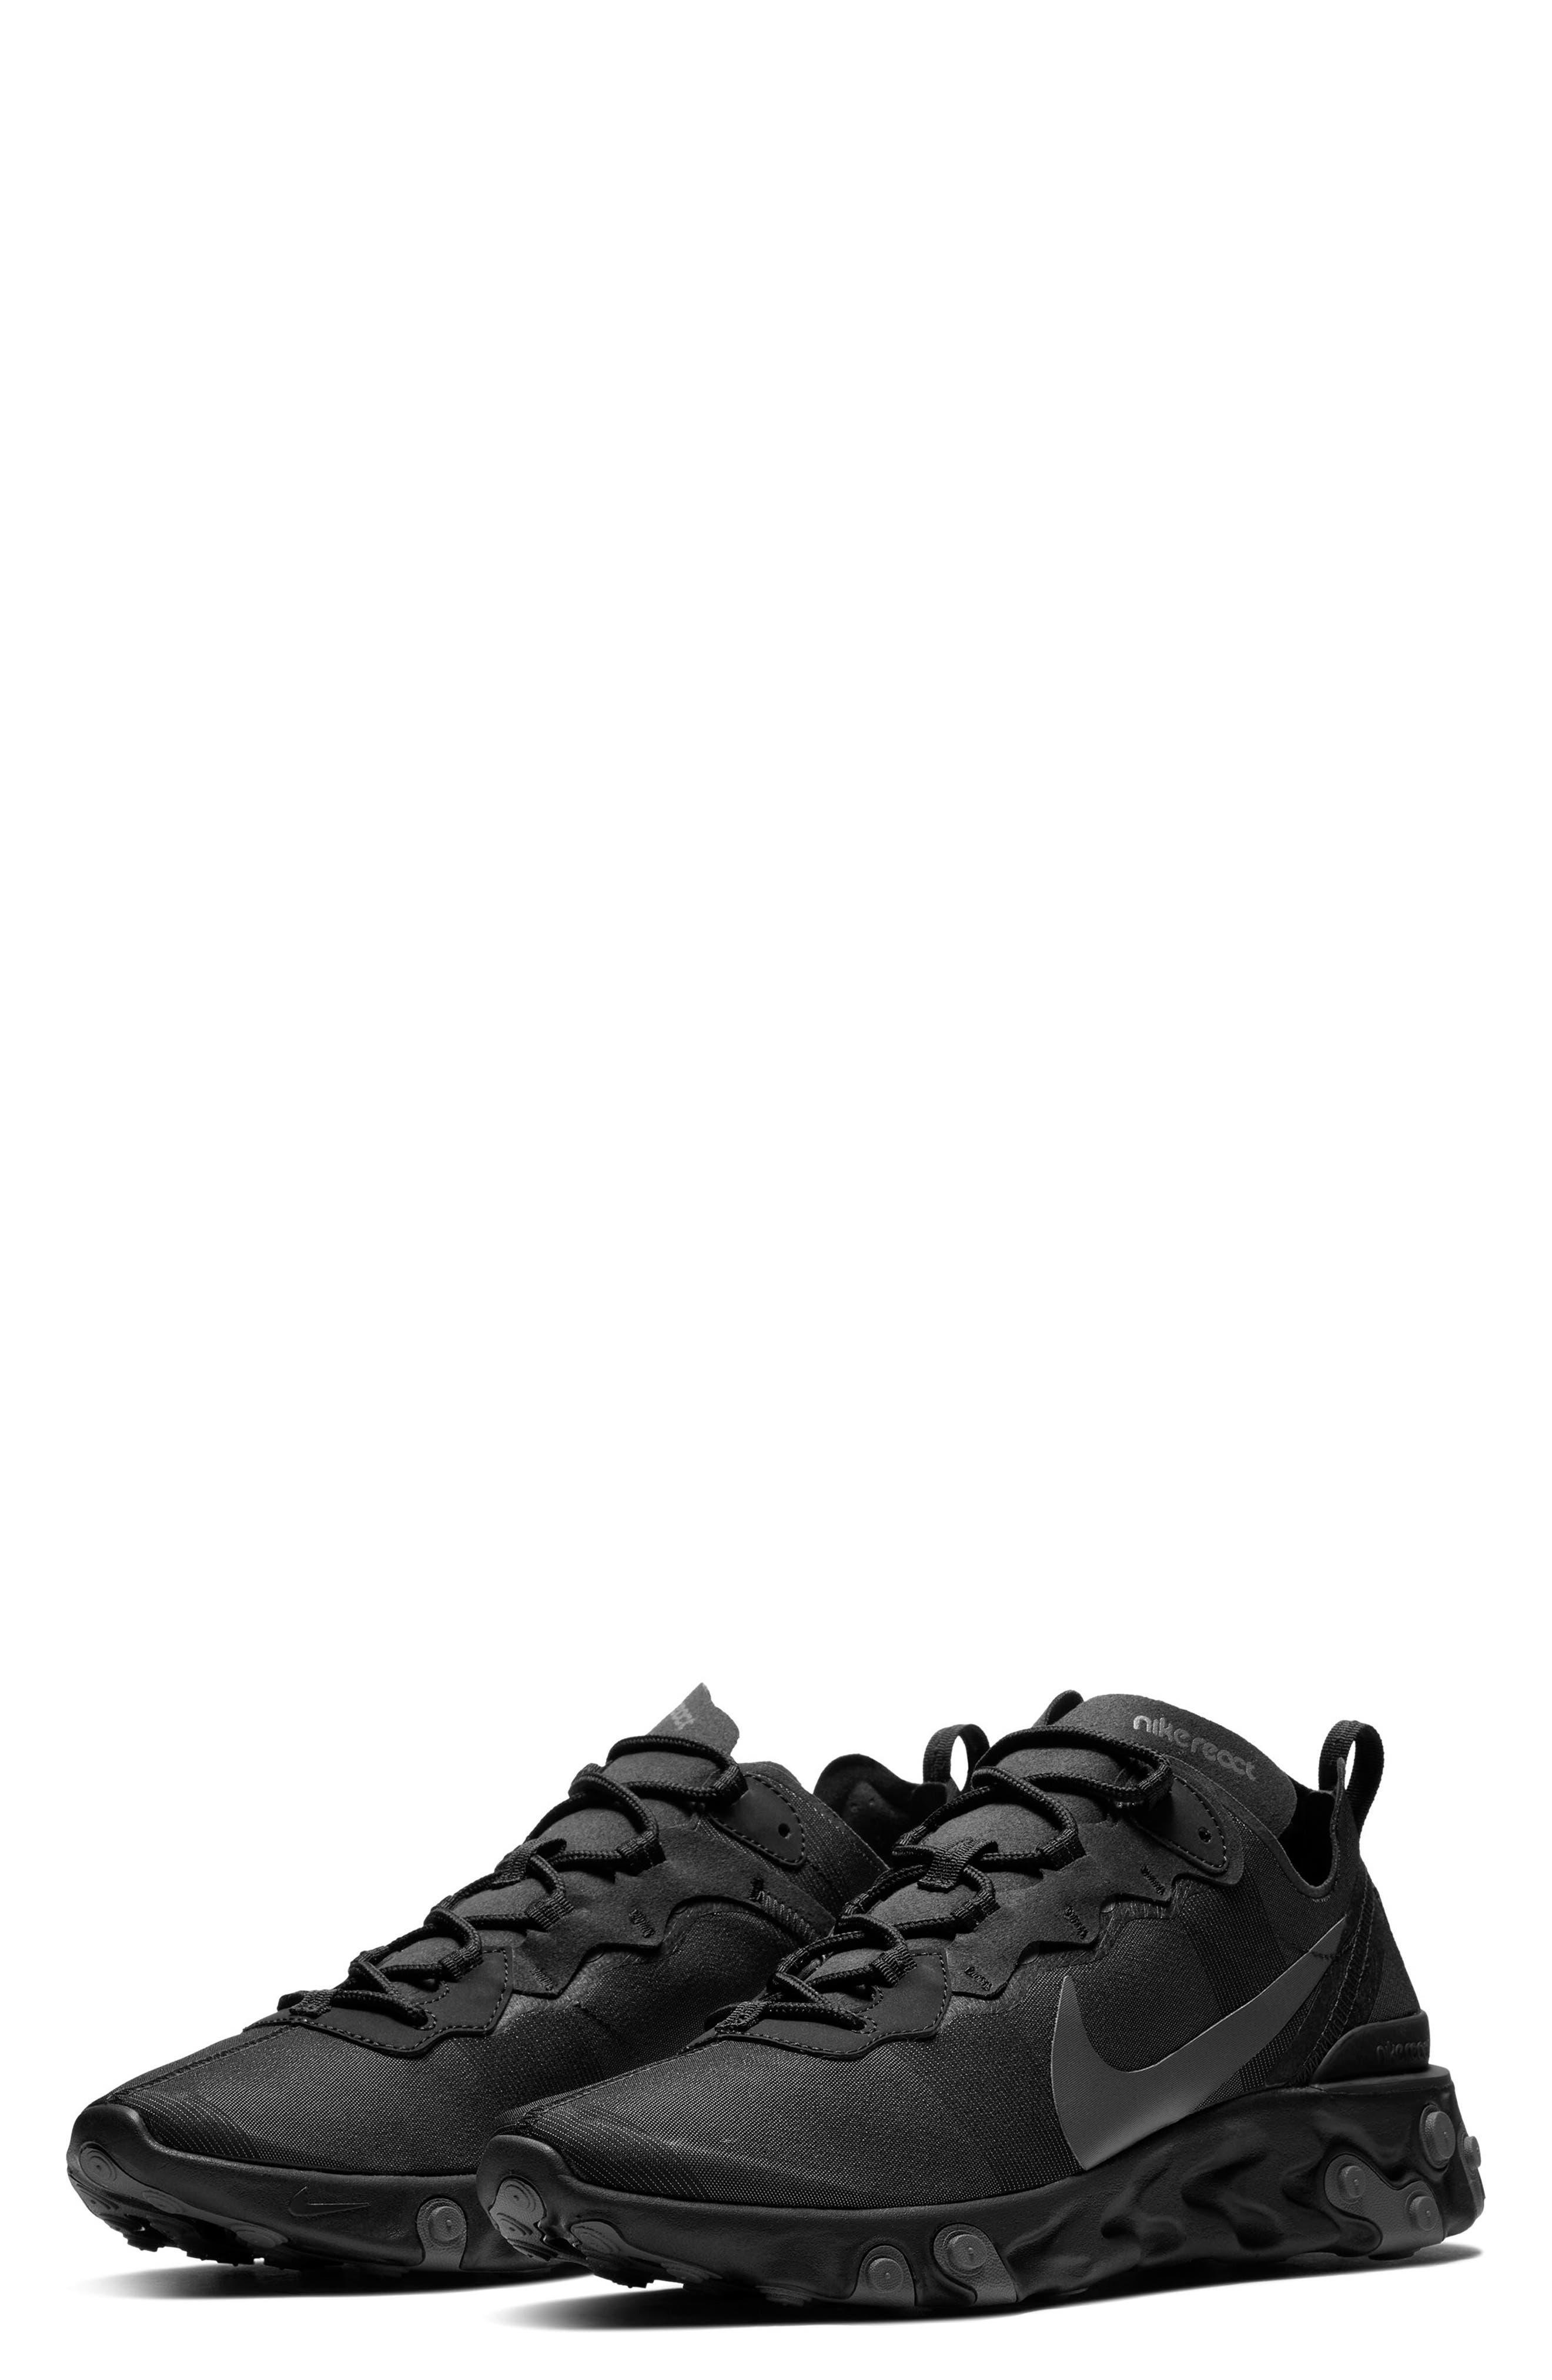 NIKE, React Element 55 Sneaker, Main thumbnail 1, color, BLACK/ DARK GREY